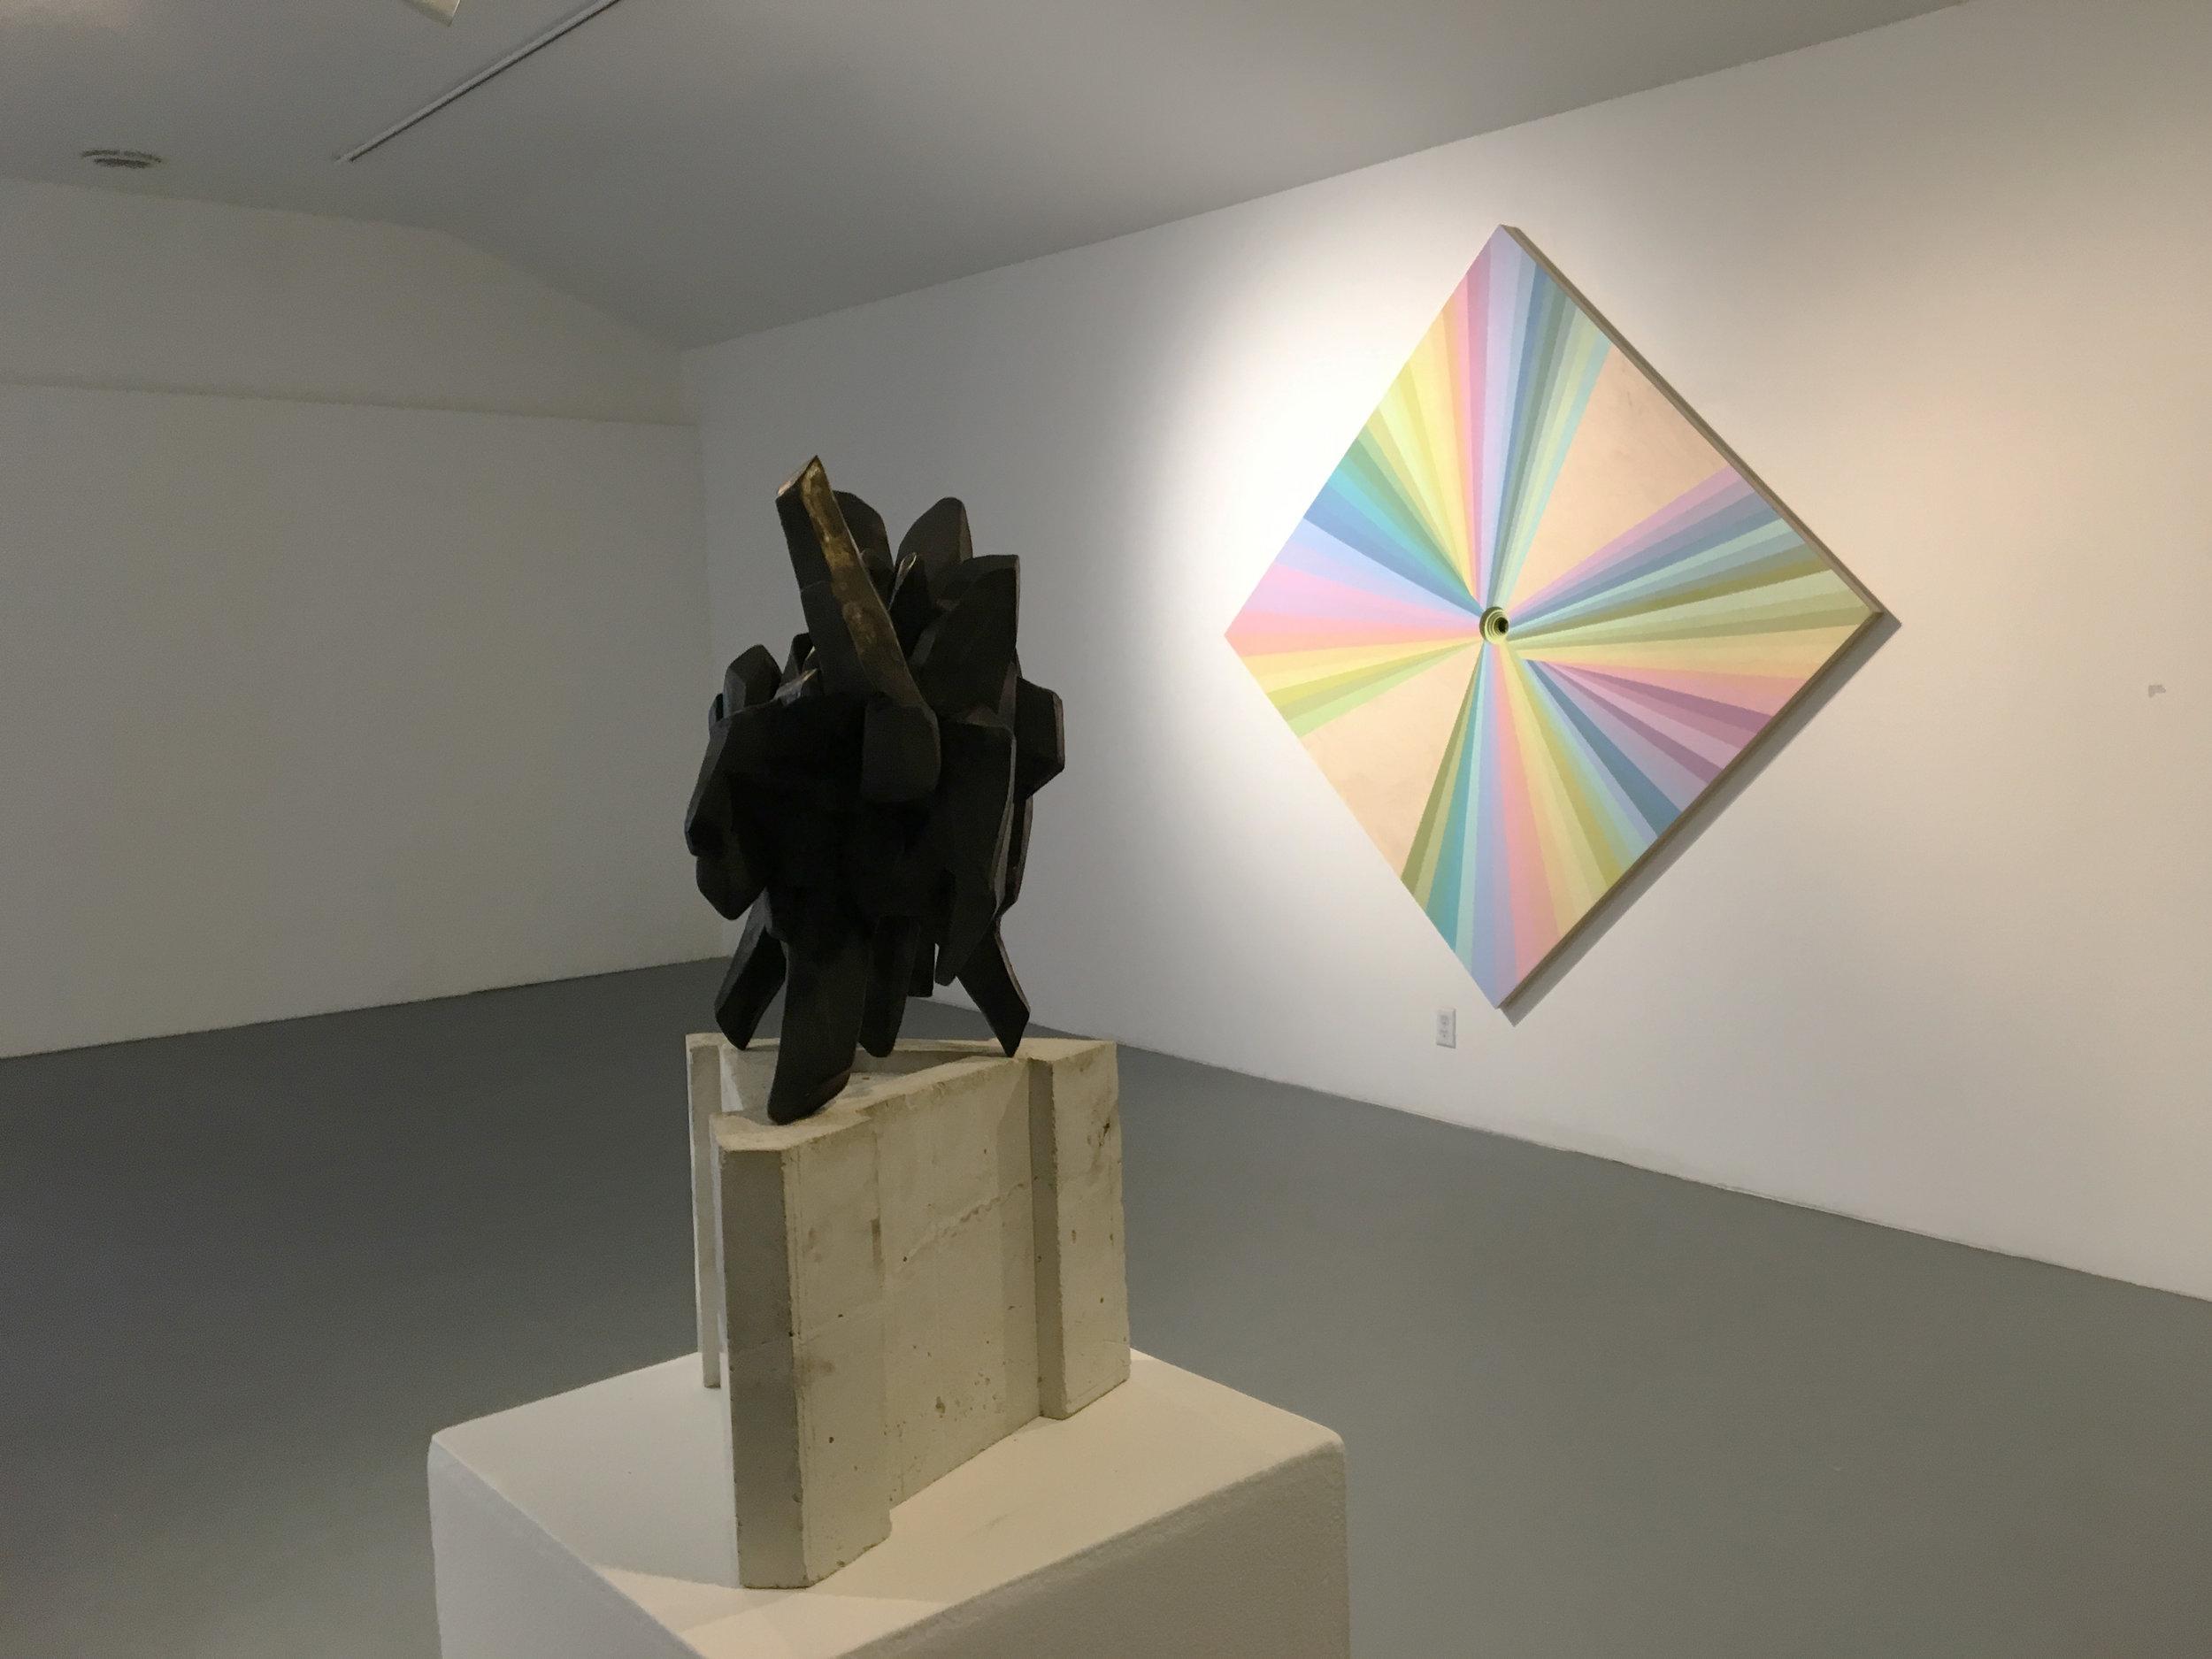 The Black Crystal & The Rainbow Warrior Painting